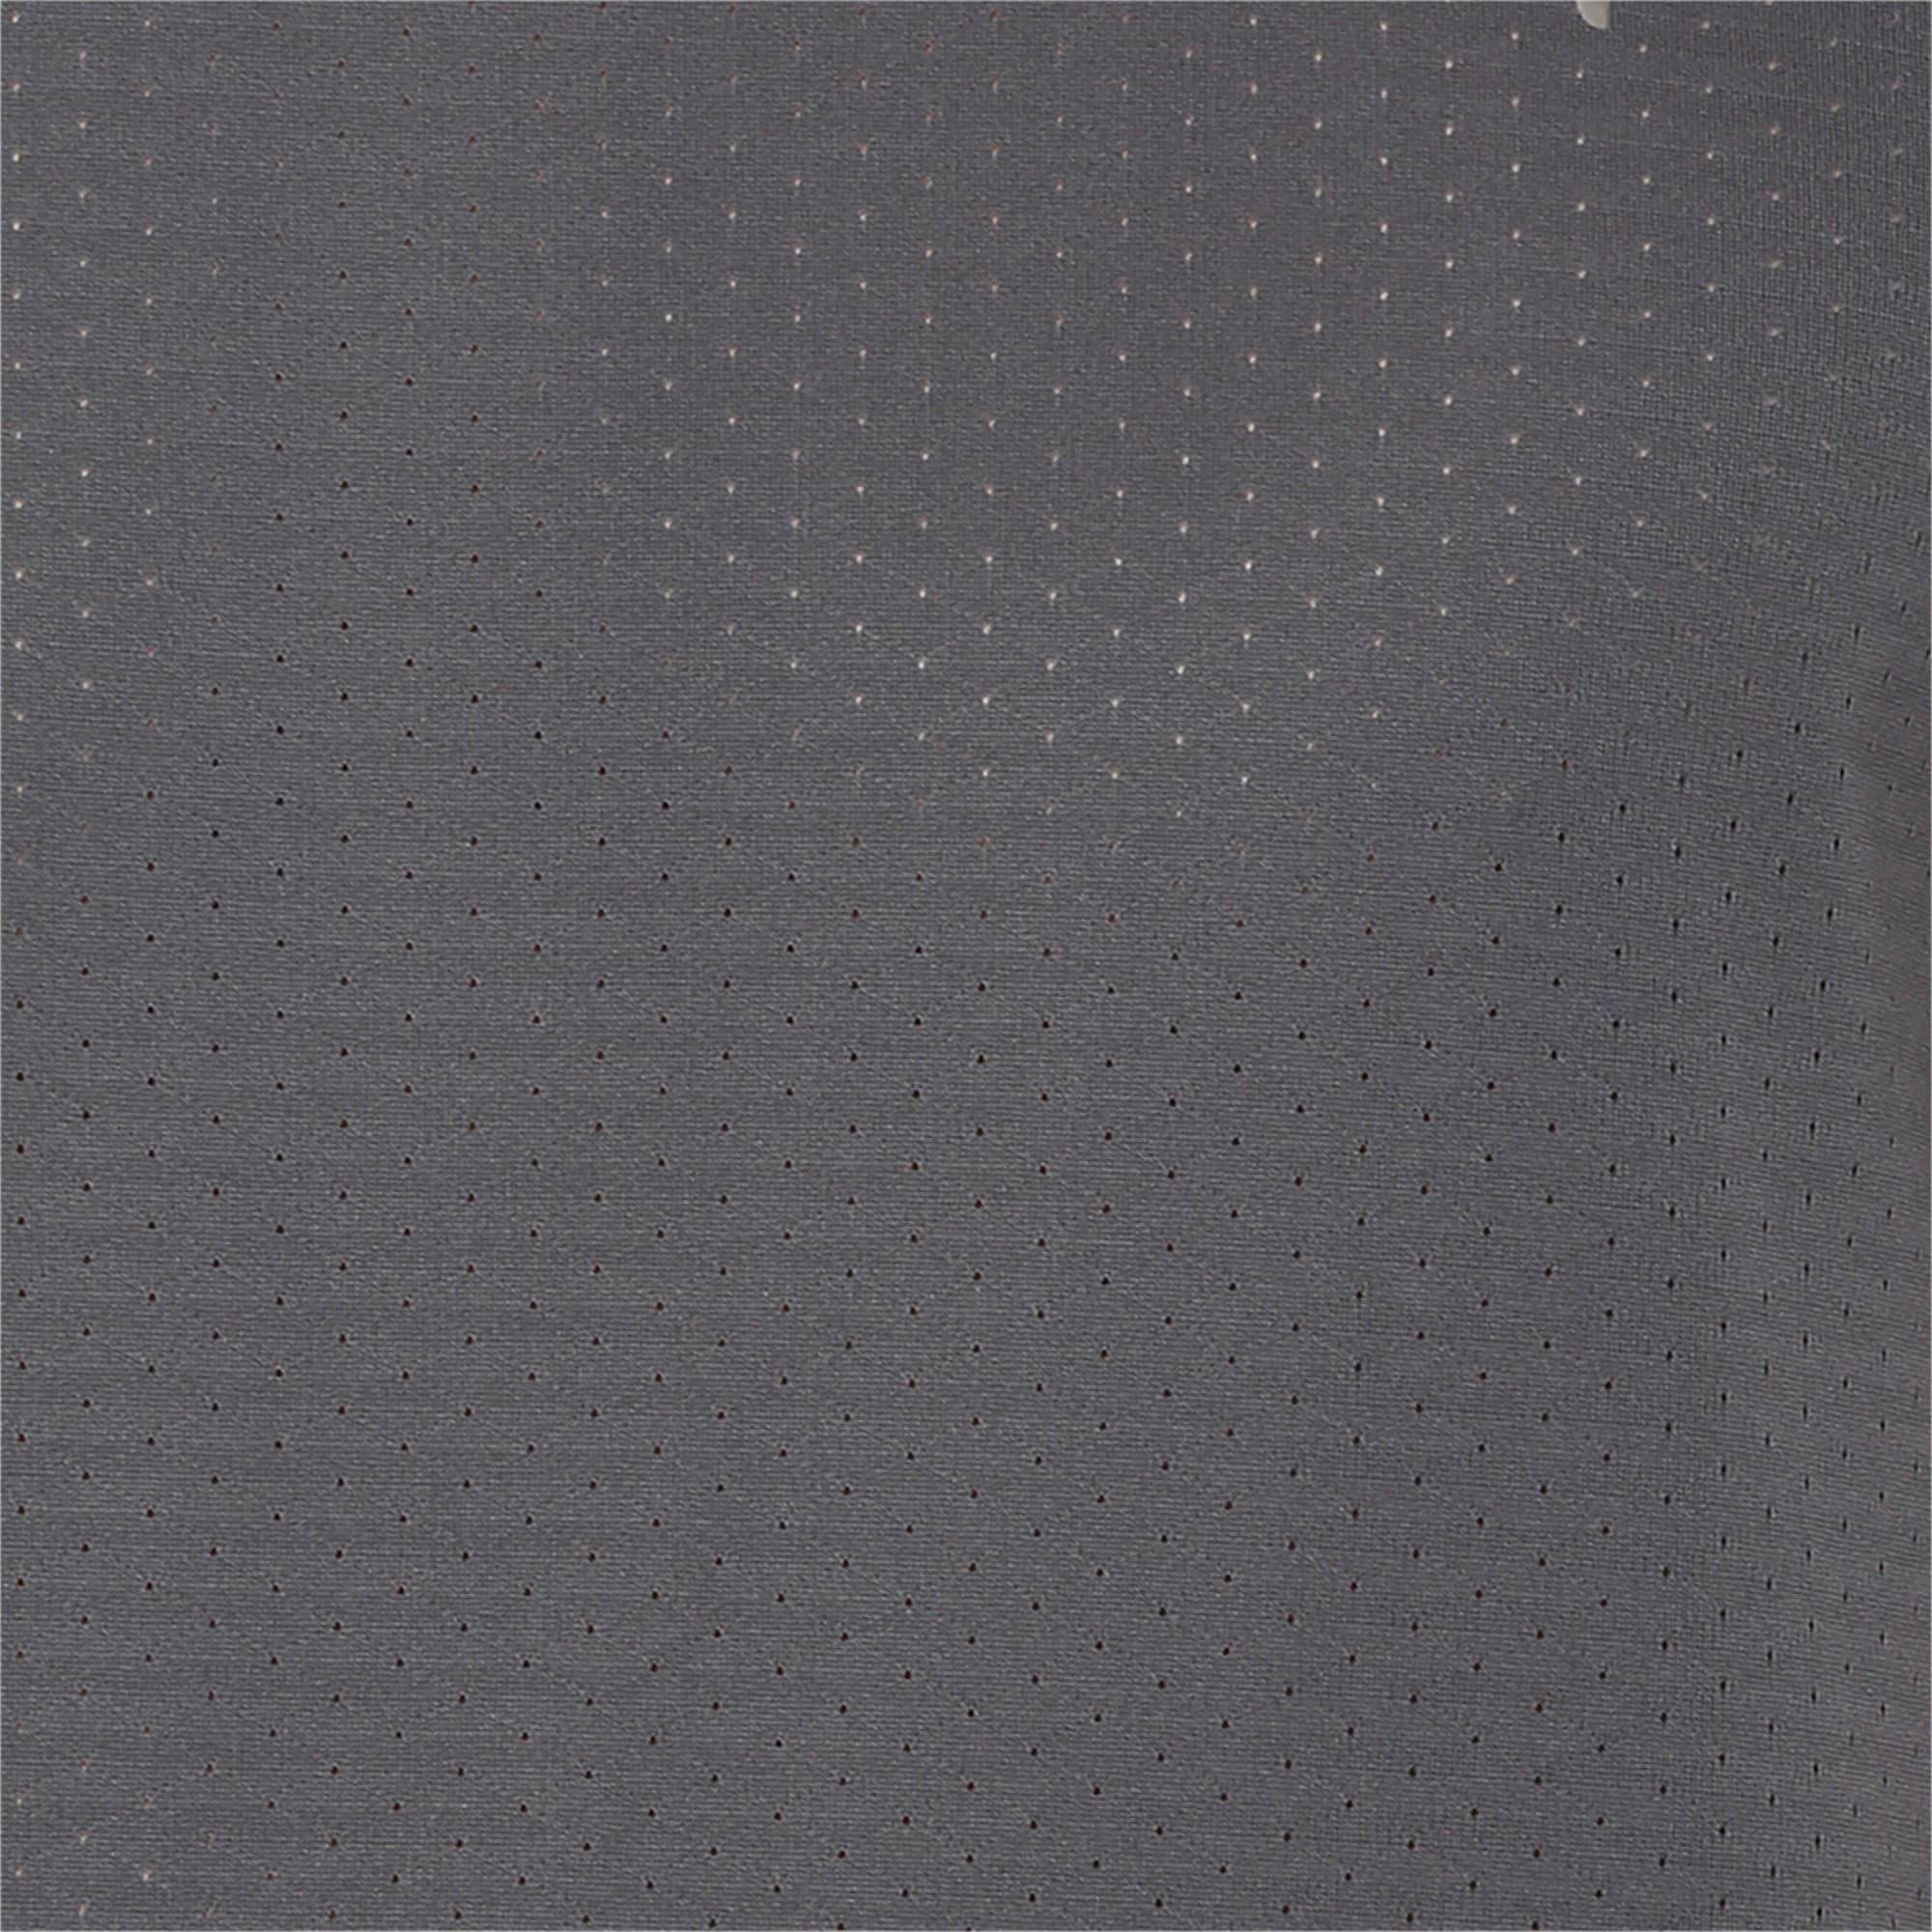 Thumbnail 6 of A.C.E. SS Block Tee, Asphalt-Charcoal Gray, medium-IND